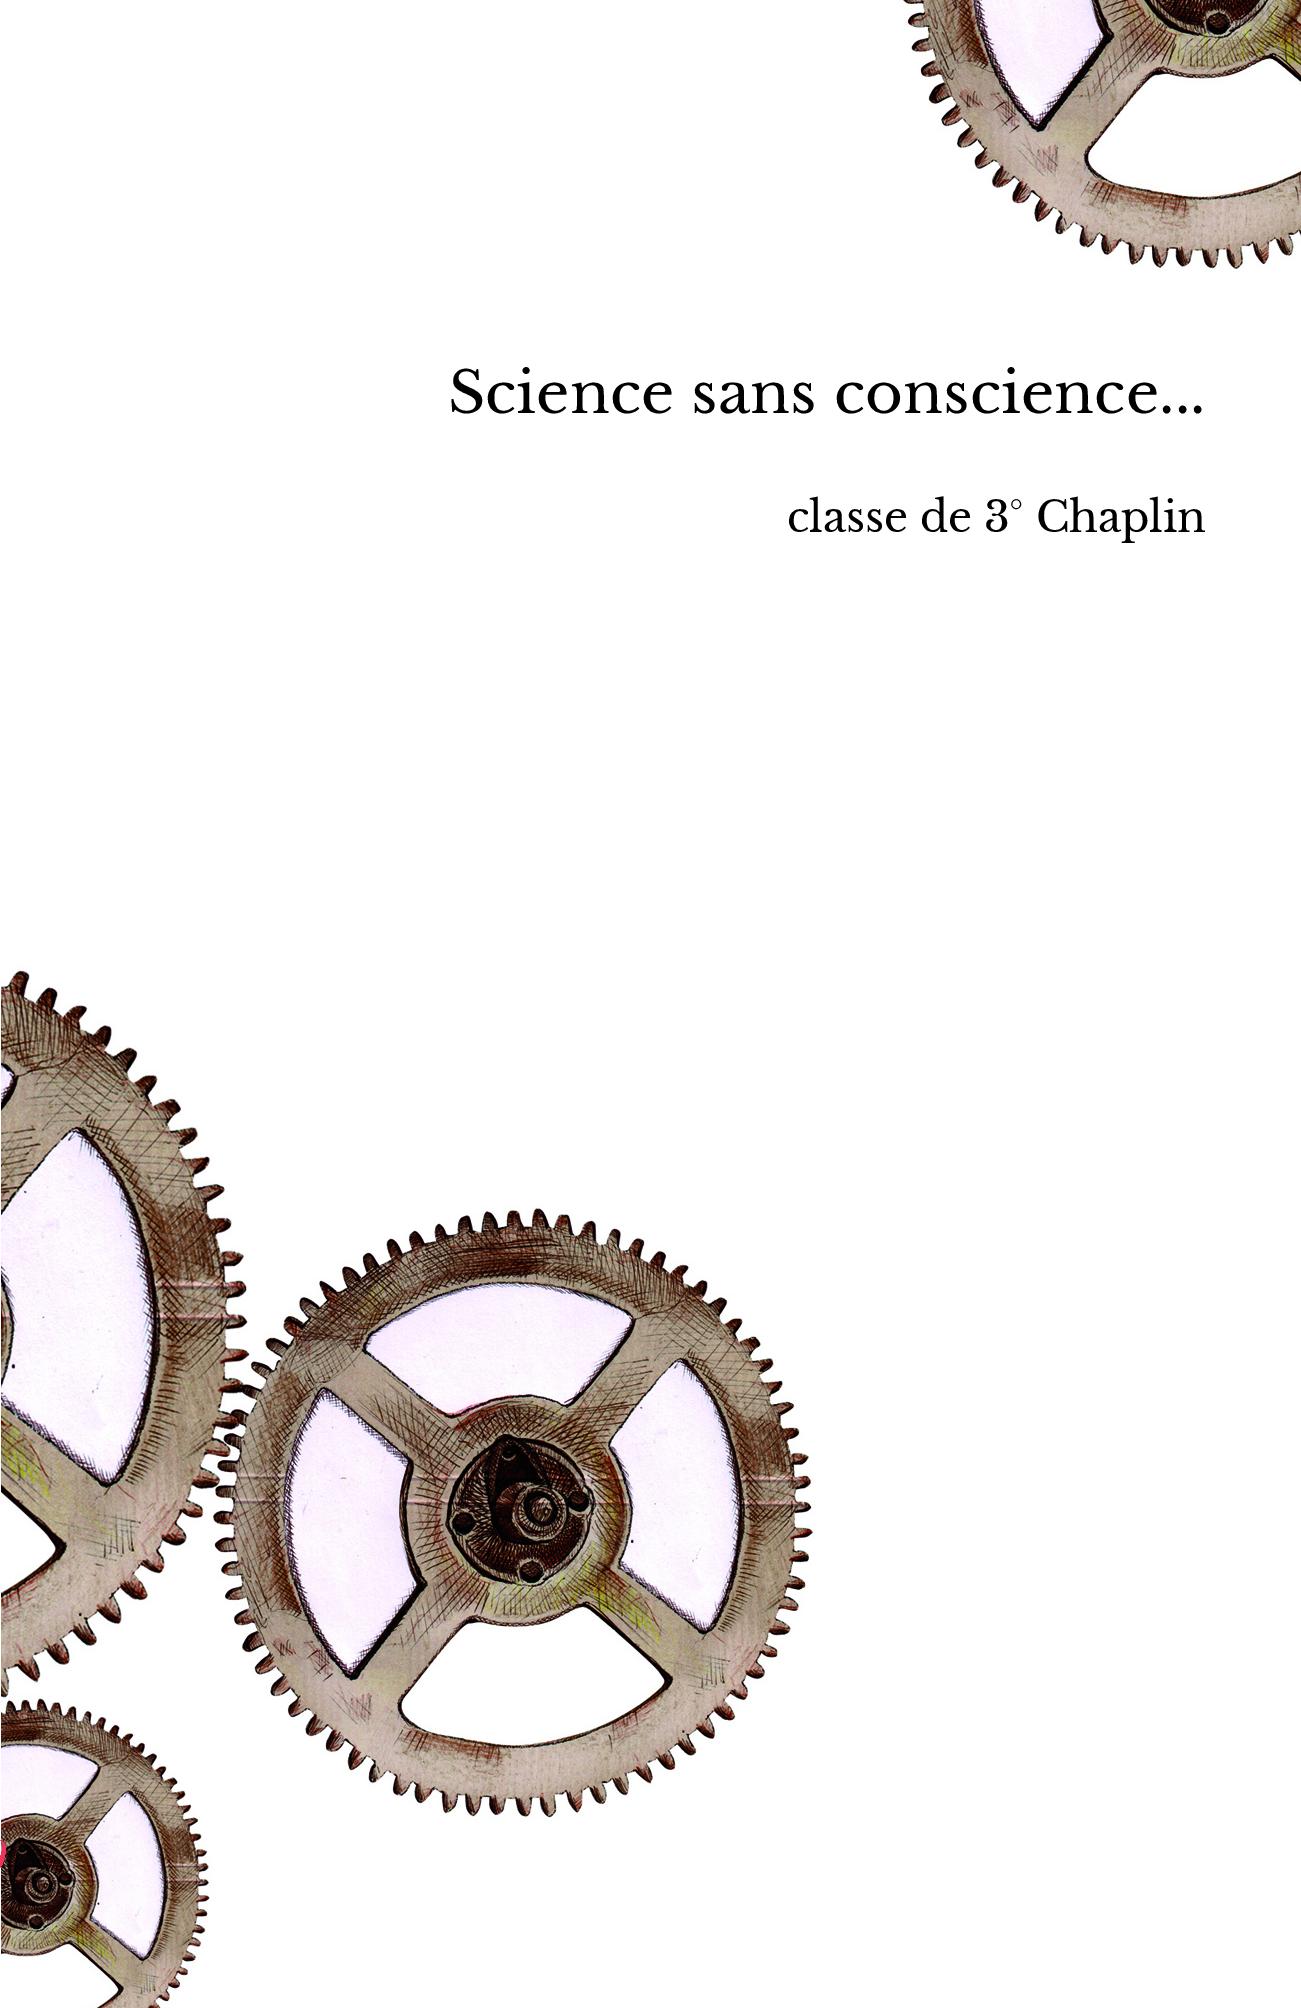 Science sans conscience...